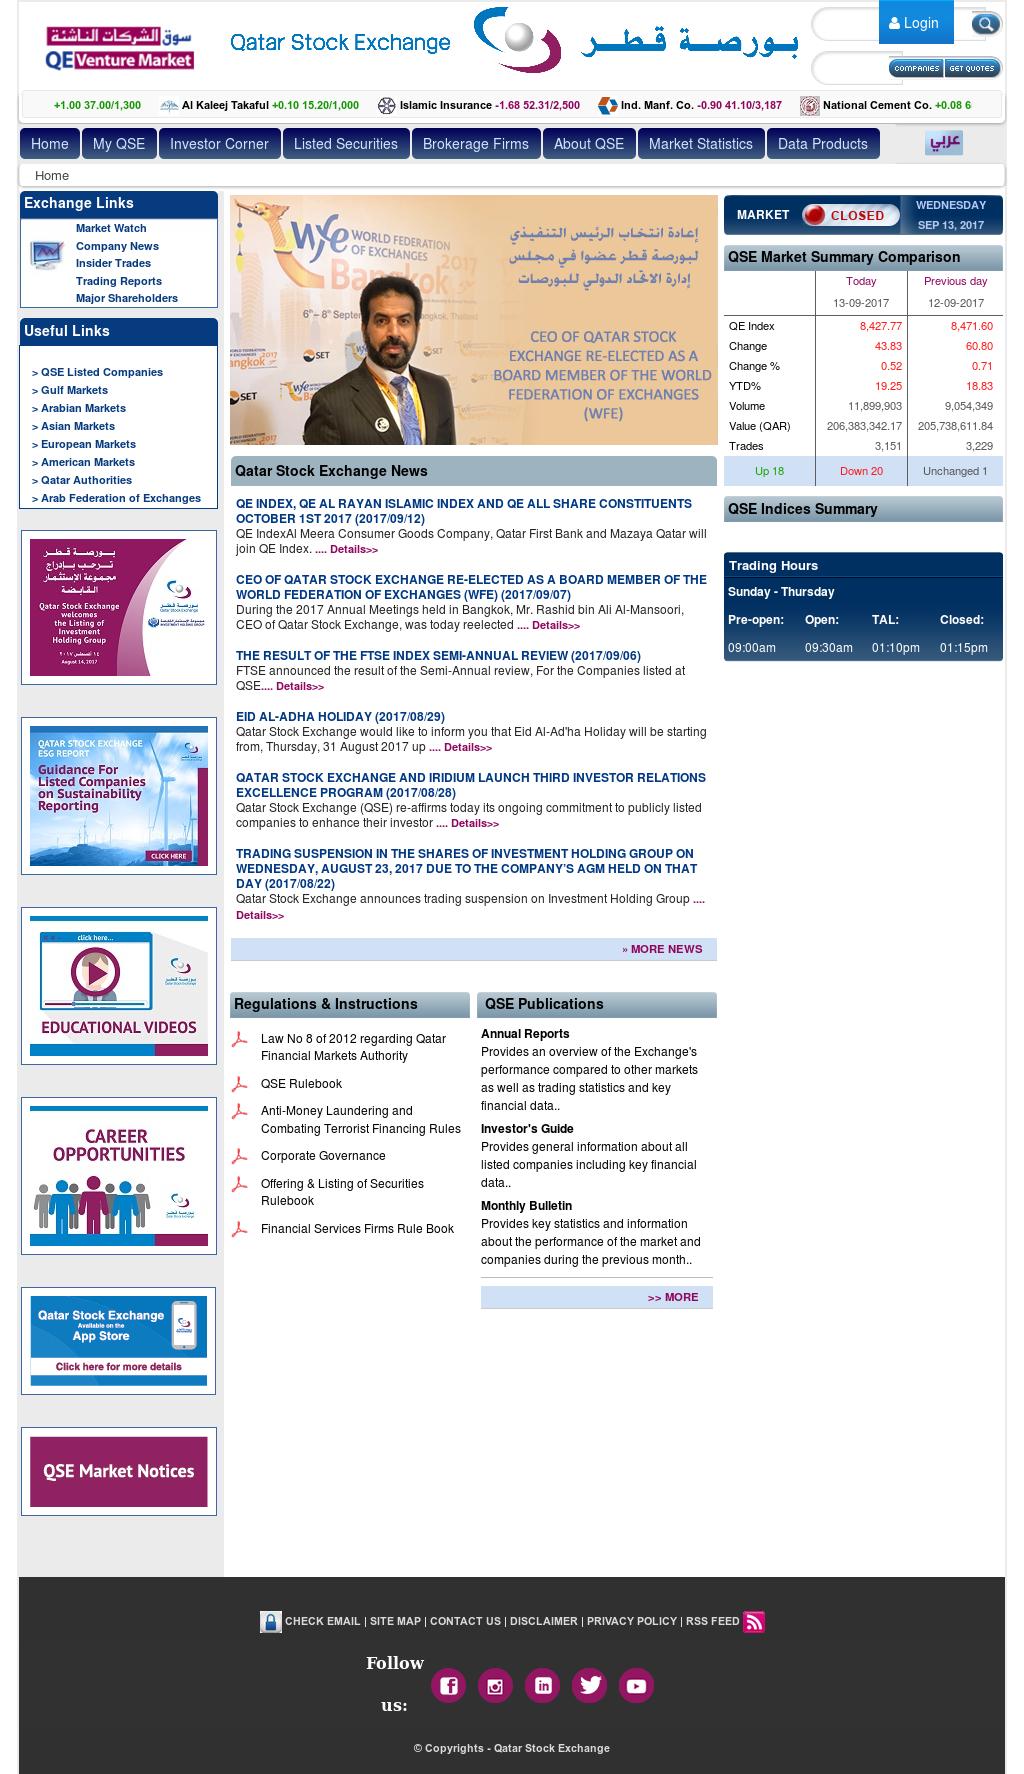 Qatar Stock Exchange Competitors, Revenue and Employees